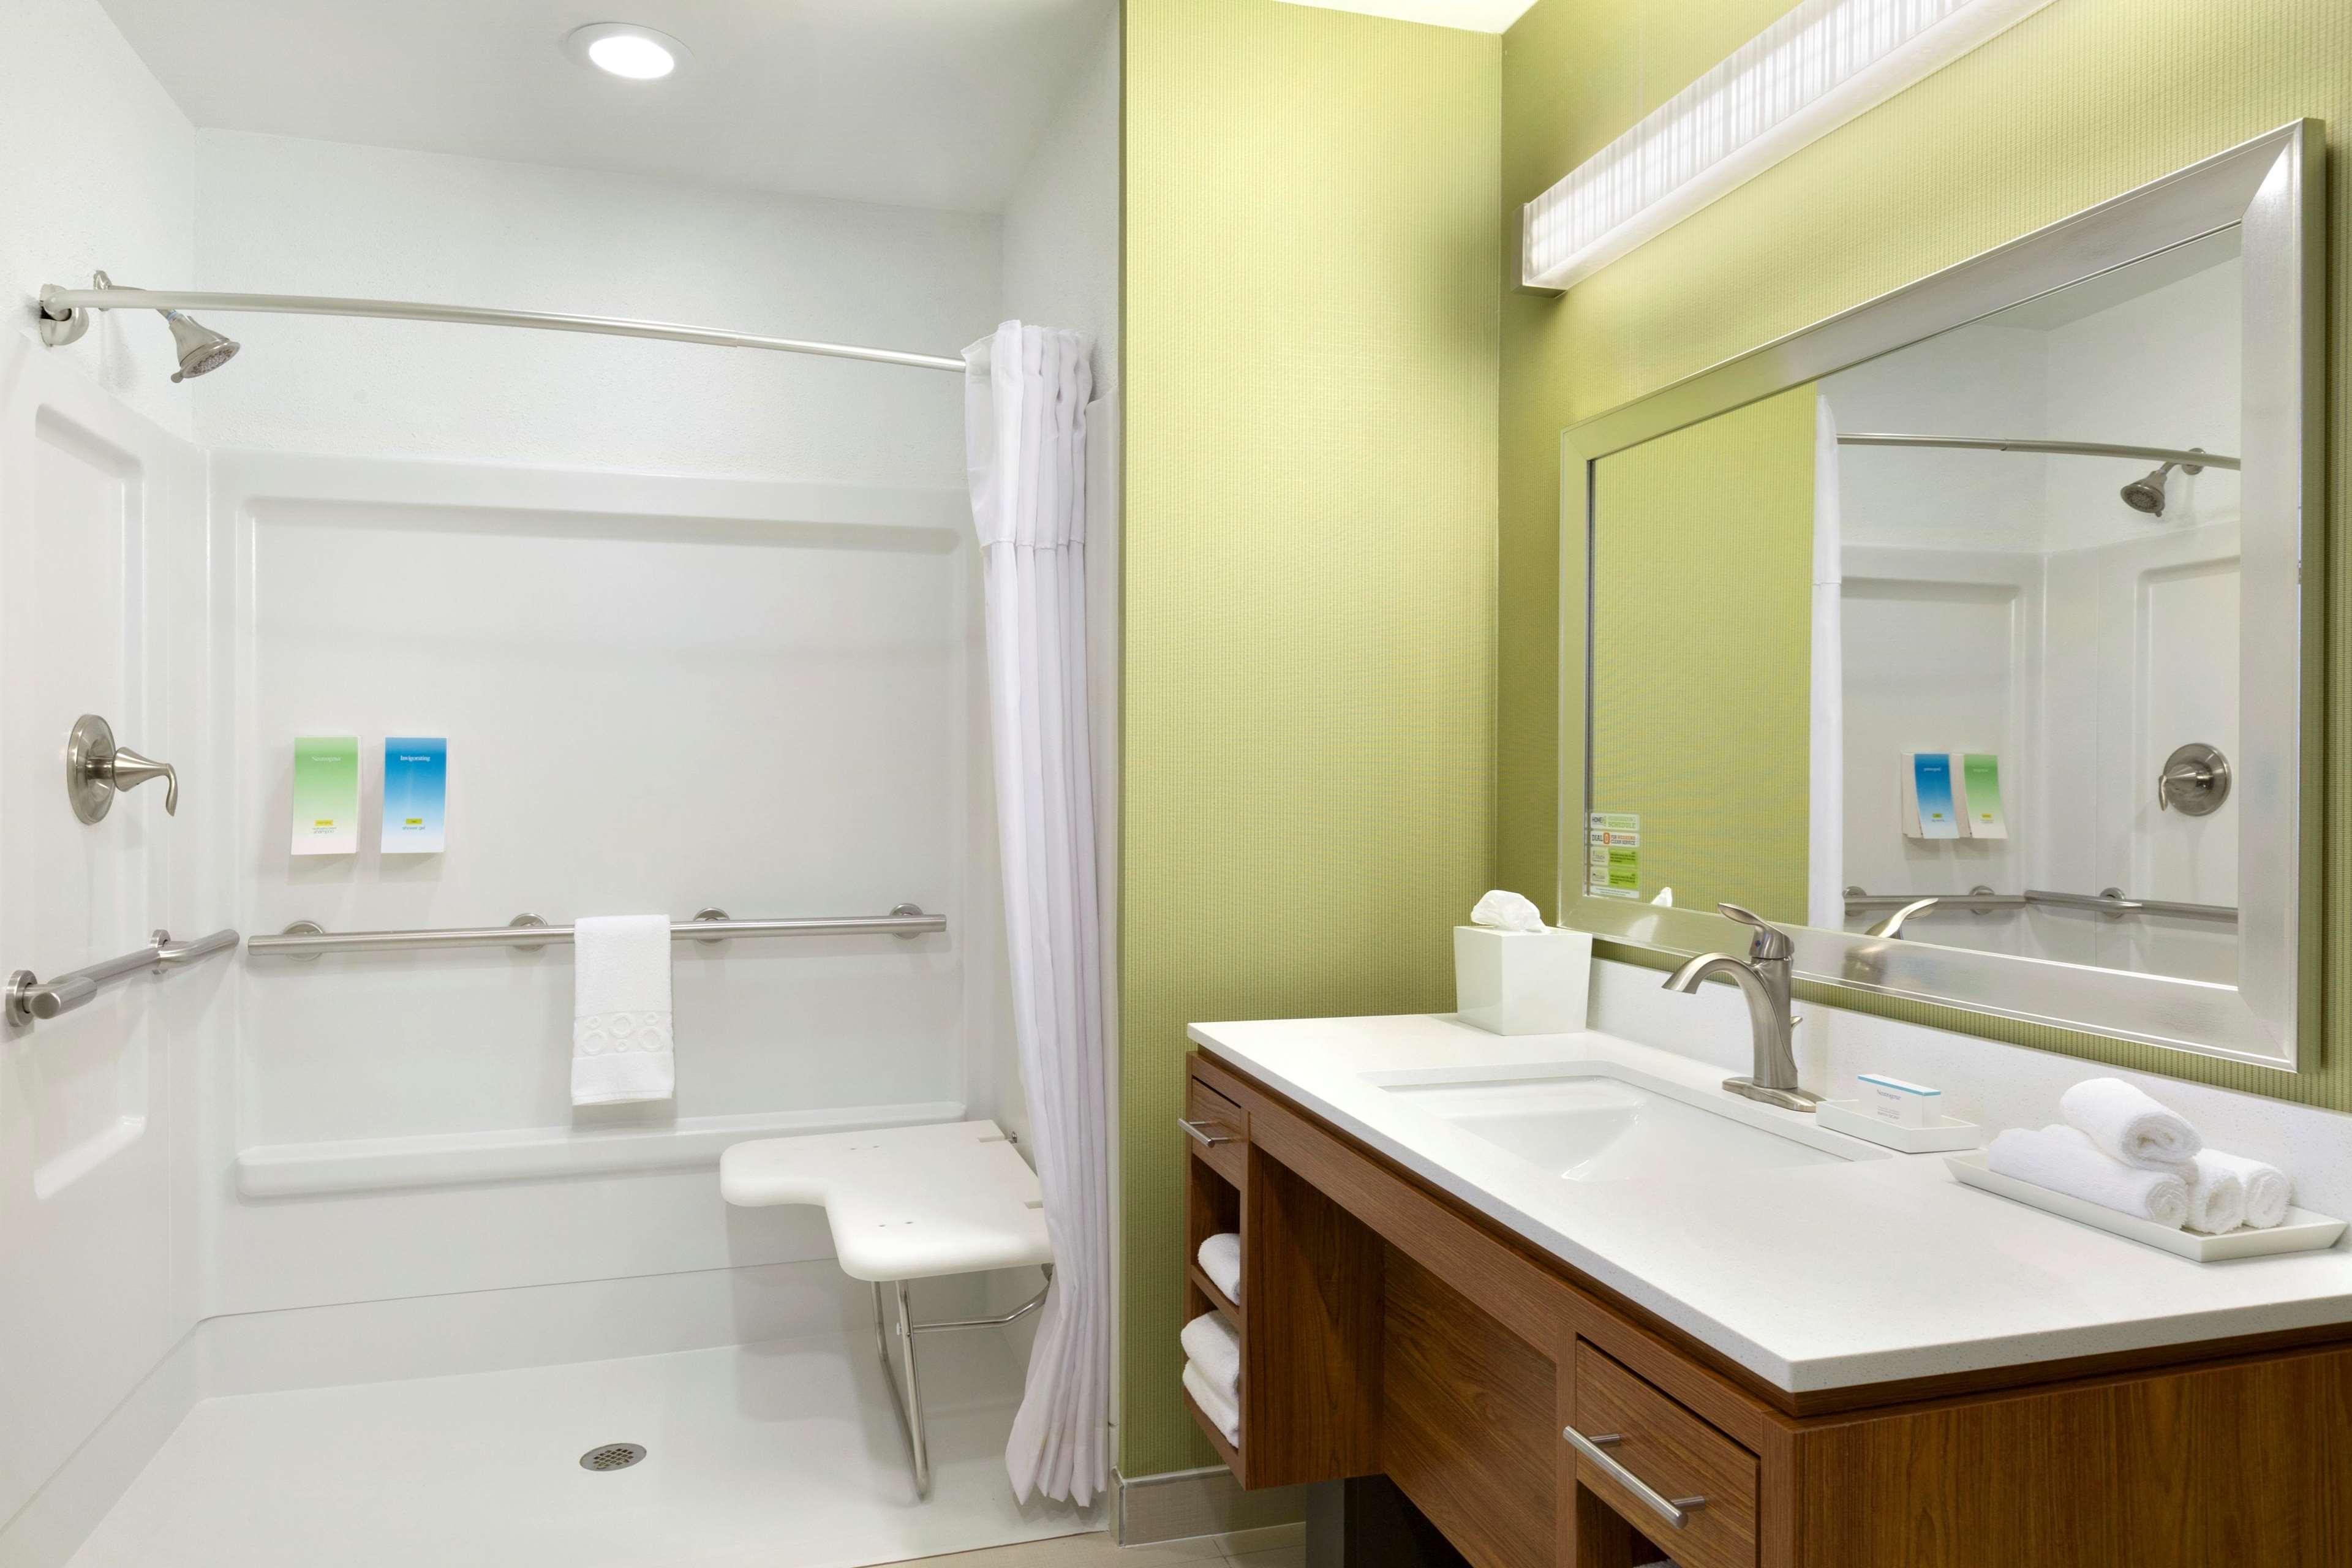 Home2 Suites by Hilton Houston Pasadena image 2